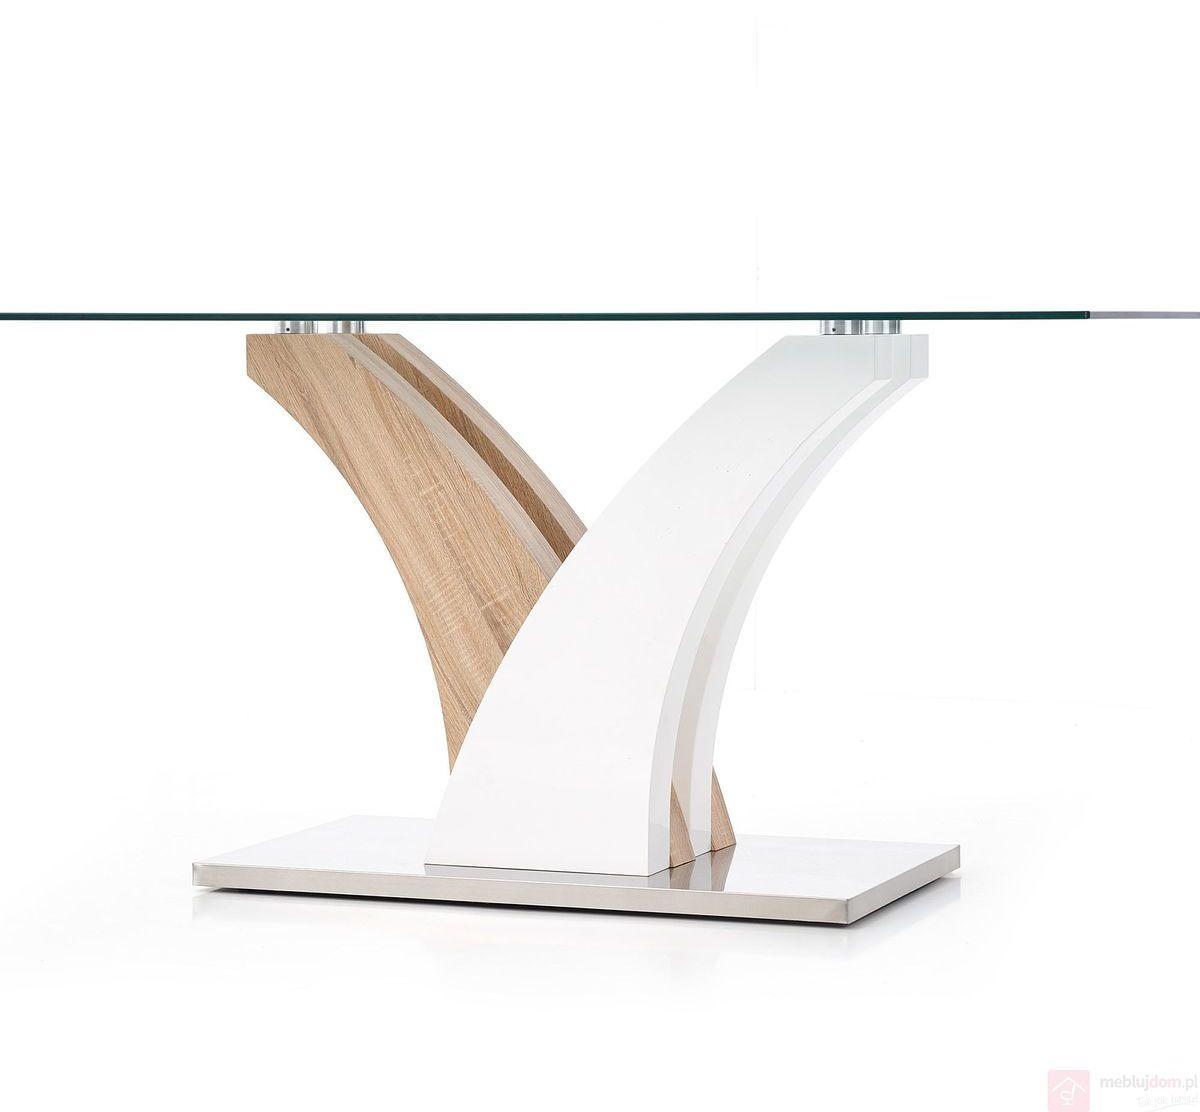 KUPON 10% NA STRONIE  Stół VILMER Halmar 90x160 cm, Dąb sonoma + biały